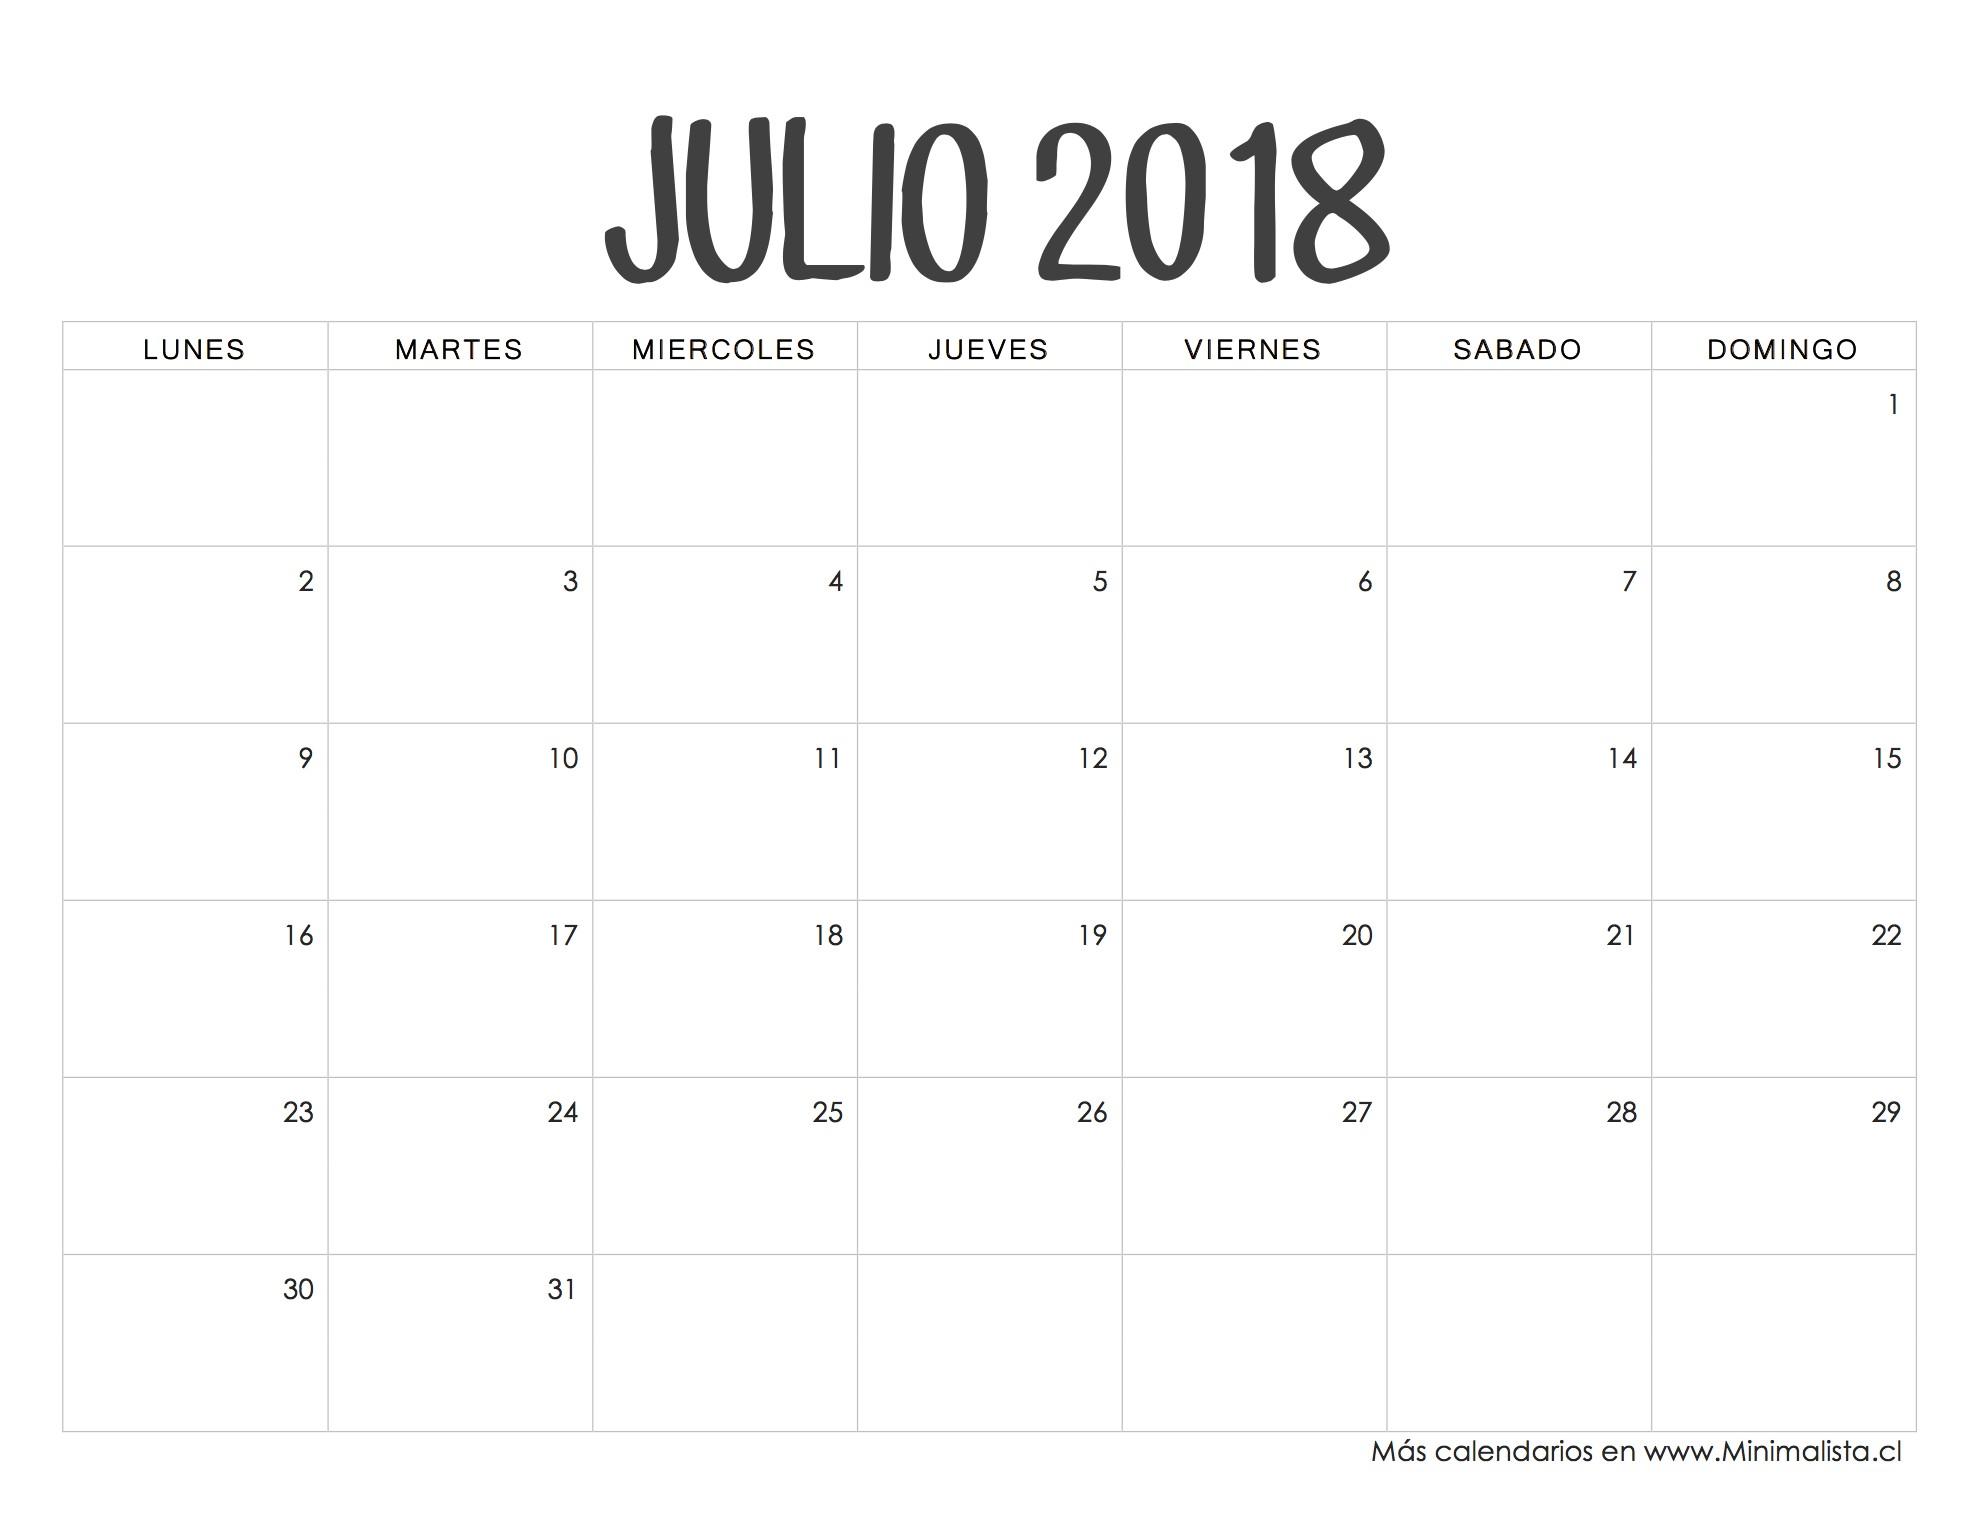 Calendario Mensual 2019 Para Imprimir Minimalista Más Arriba-a-fecha Calendario Julio 2019 Papelera Pinterest